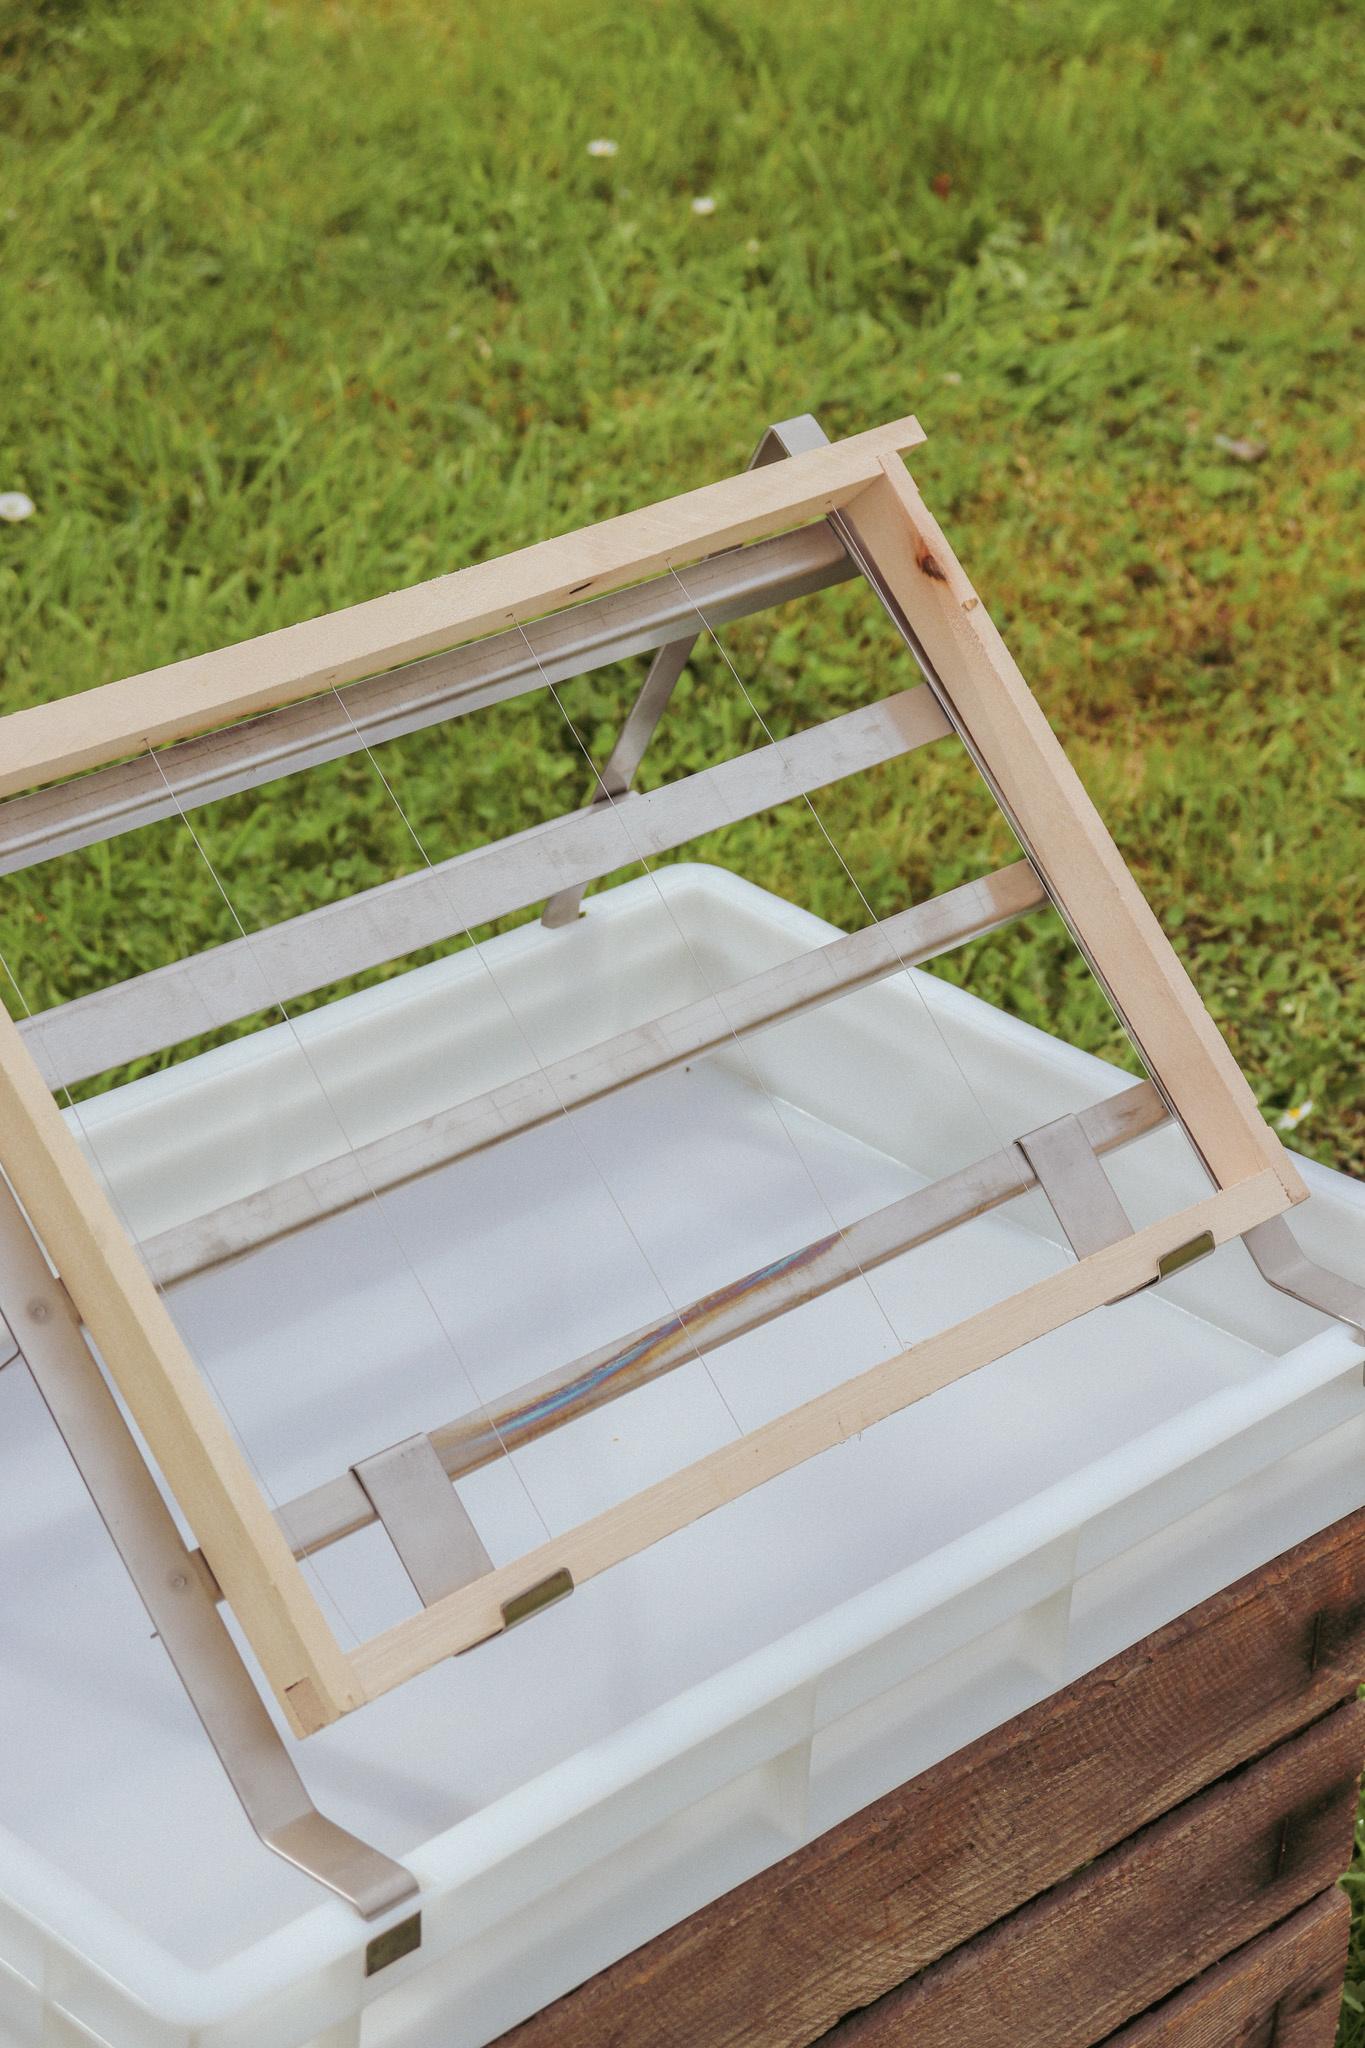 Starterspakket 'honingoogst tot 10 bijenkasten'-6